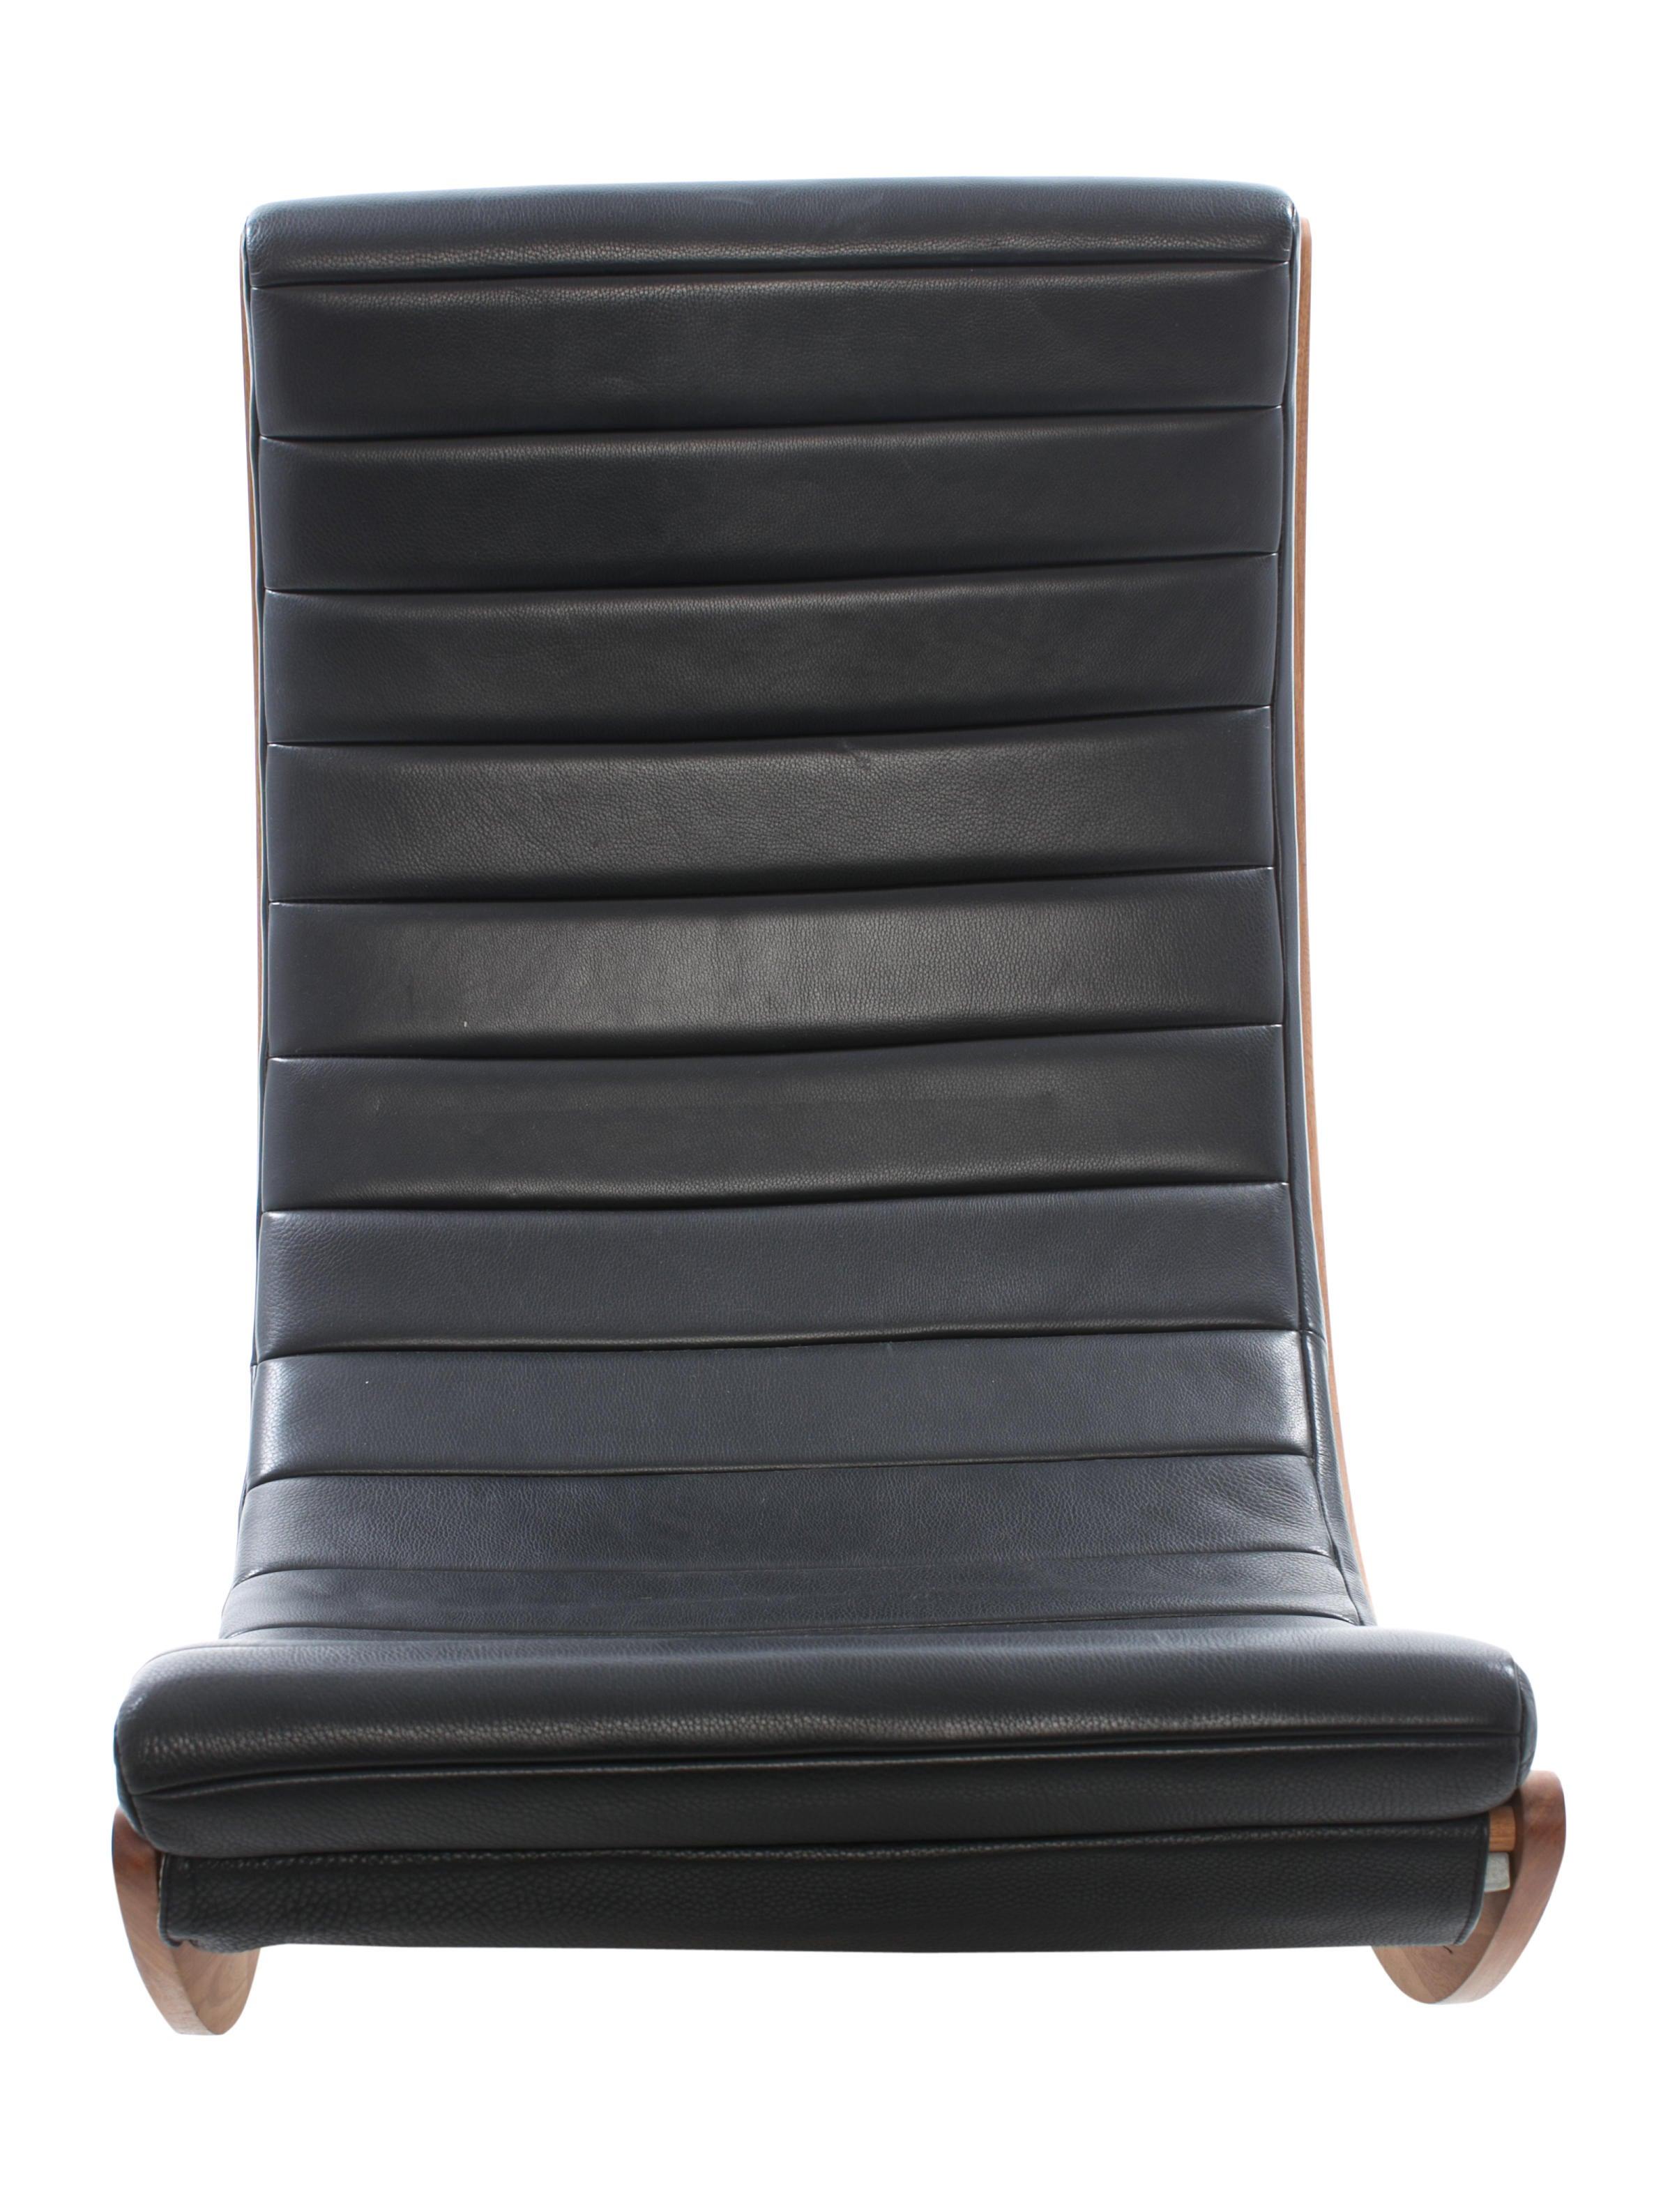 Verner Panton Relaxer Chair